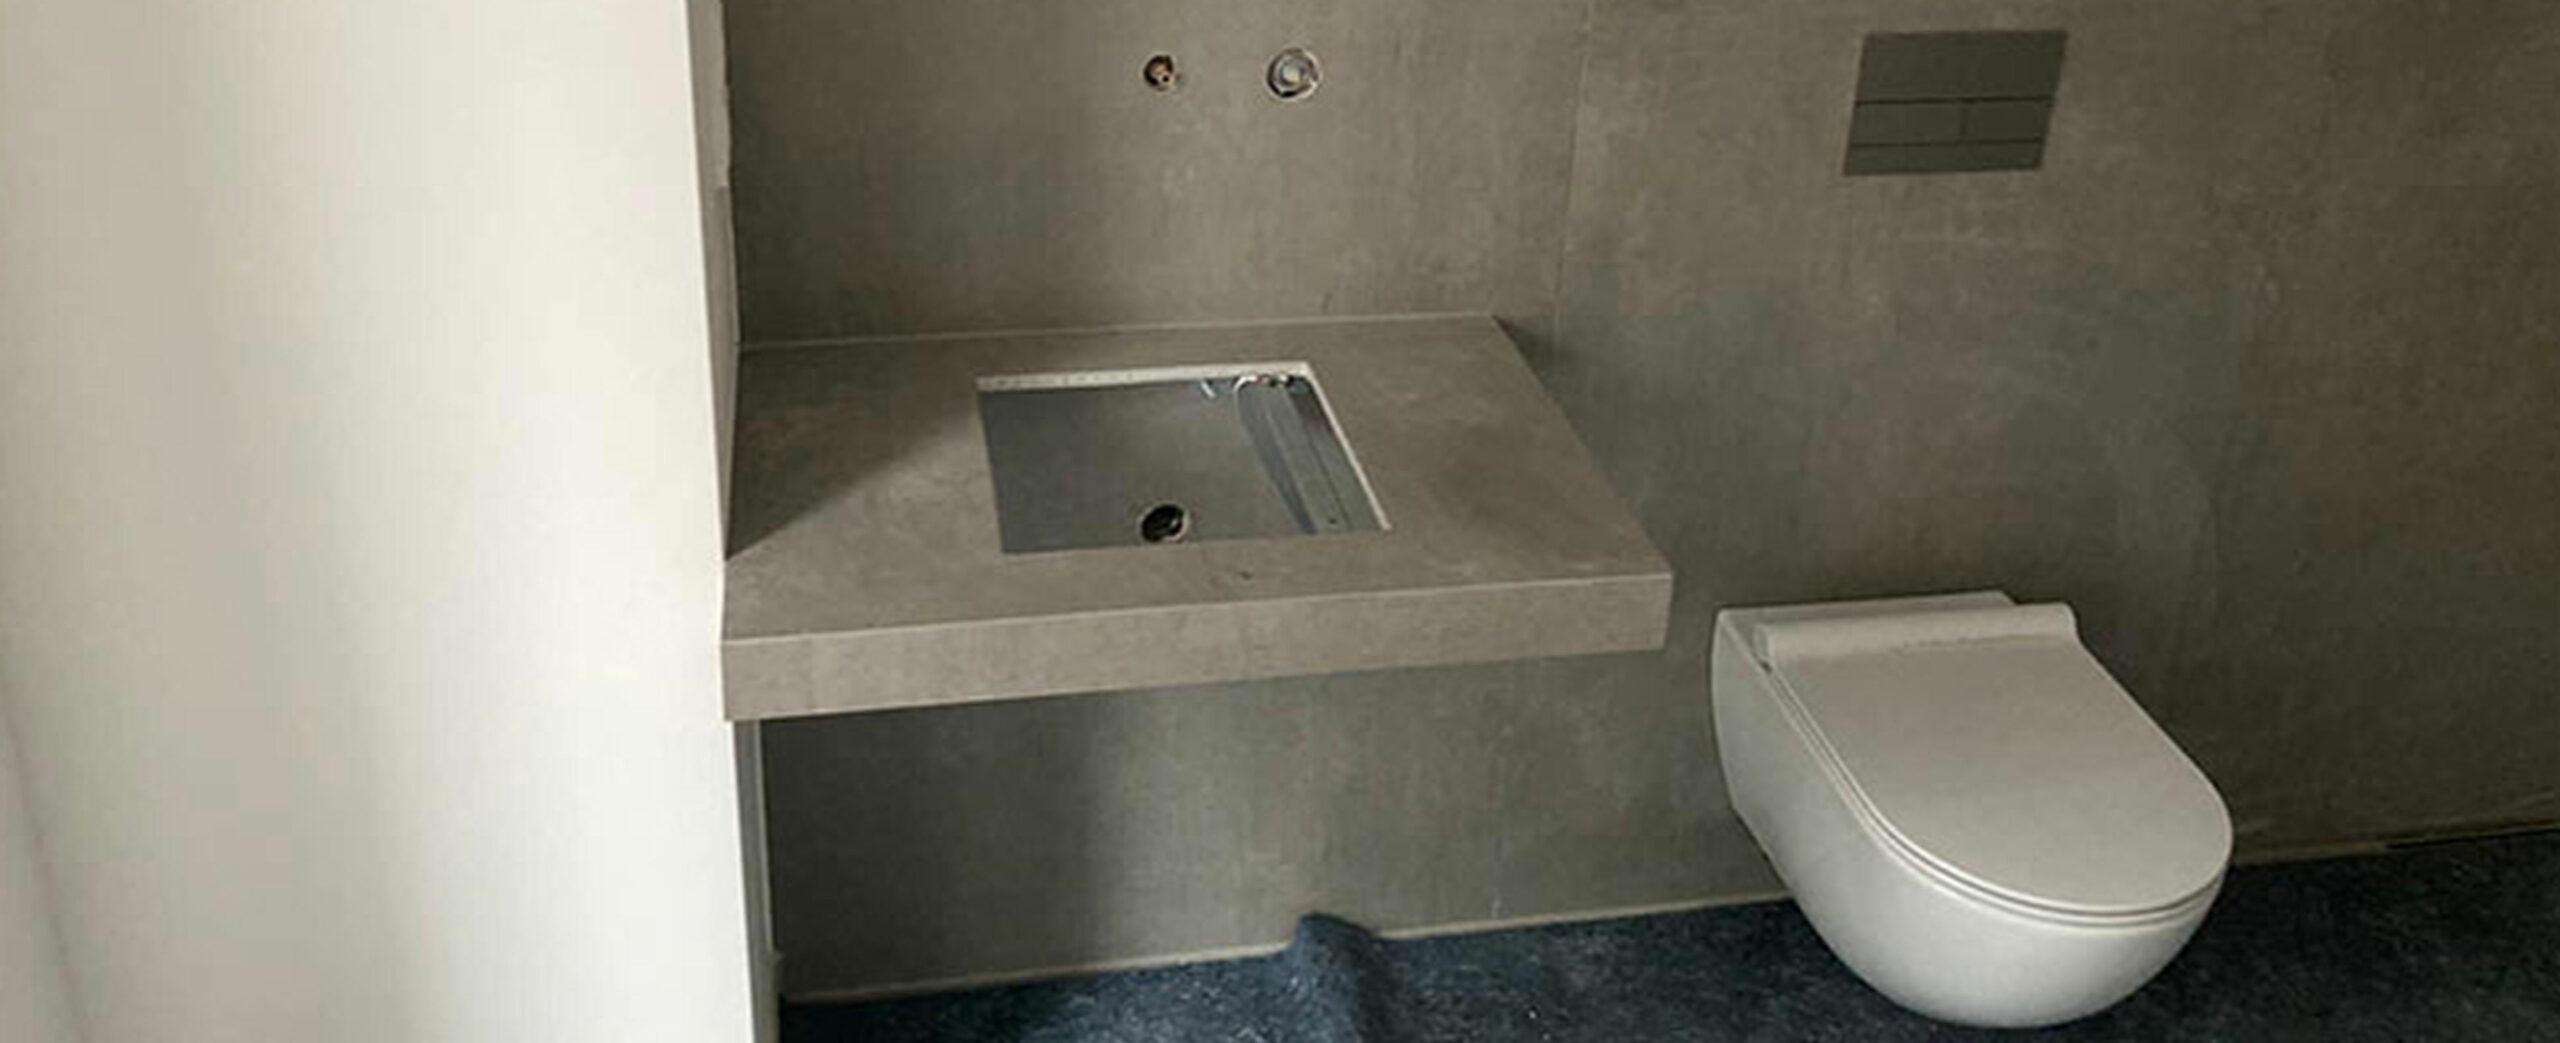 Fliesen-Beverungen-Waschbecken